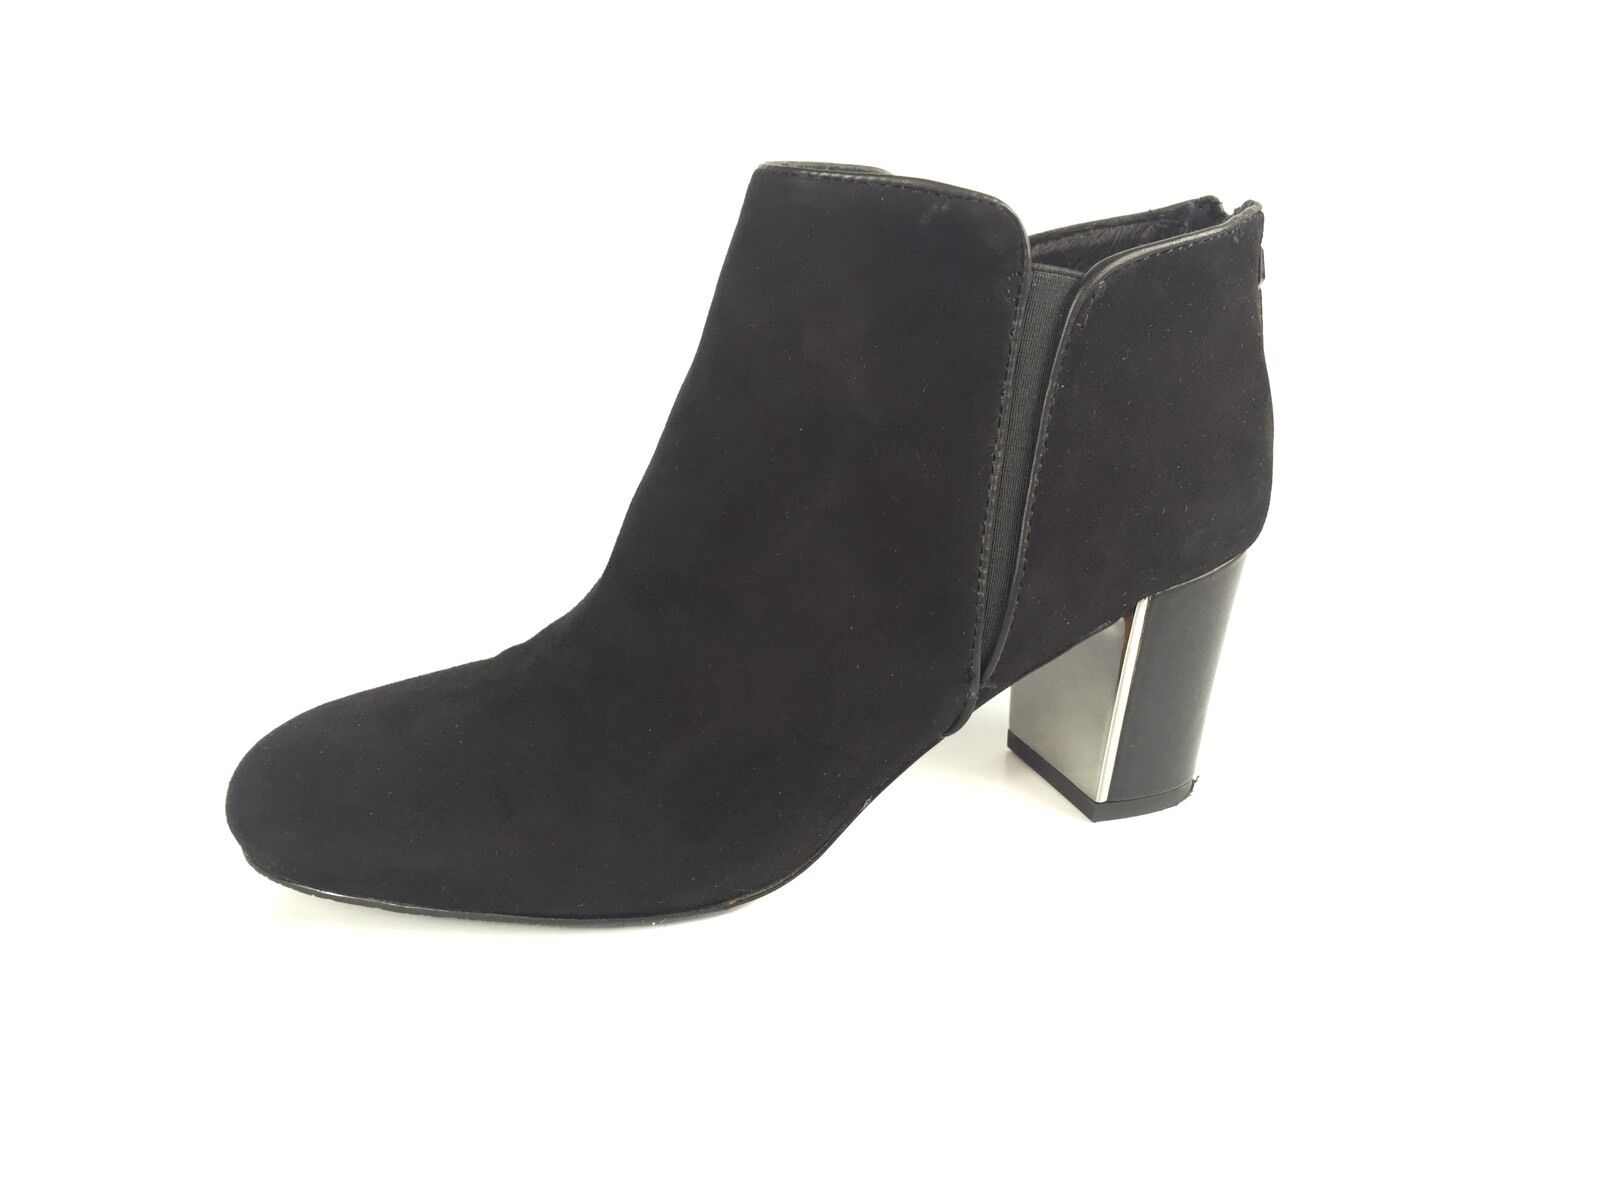 Donald J Pliner Cosmo gamuza tobillo botas negras para mujer mujer mujer Talla 7.5 M  precios ultra bajos